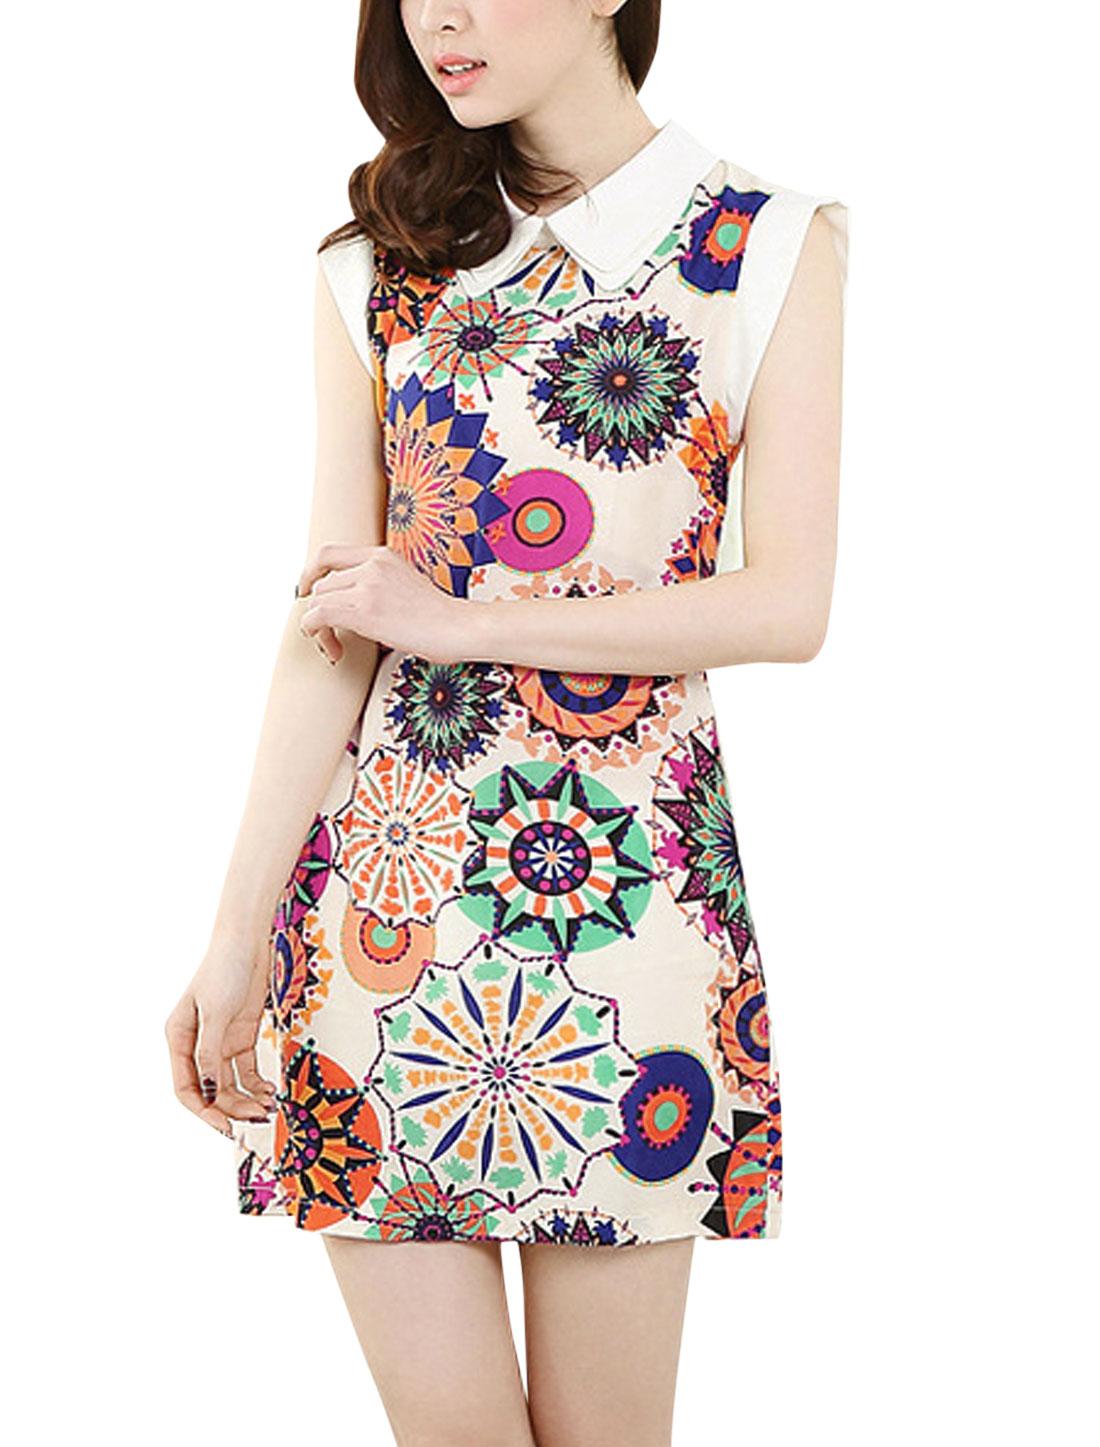 Lady Geometric Prints Double-layered Peter Pan Collar Sheath Dress Multi-color M